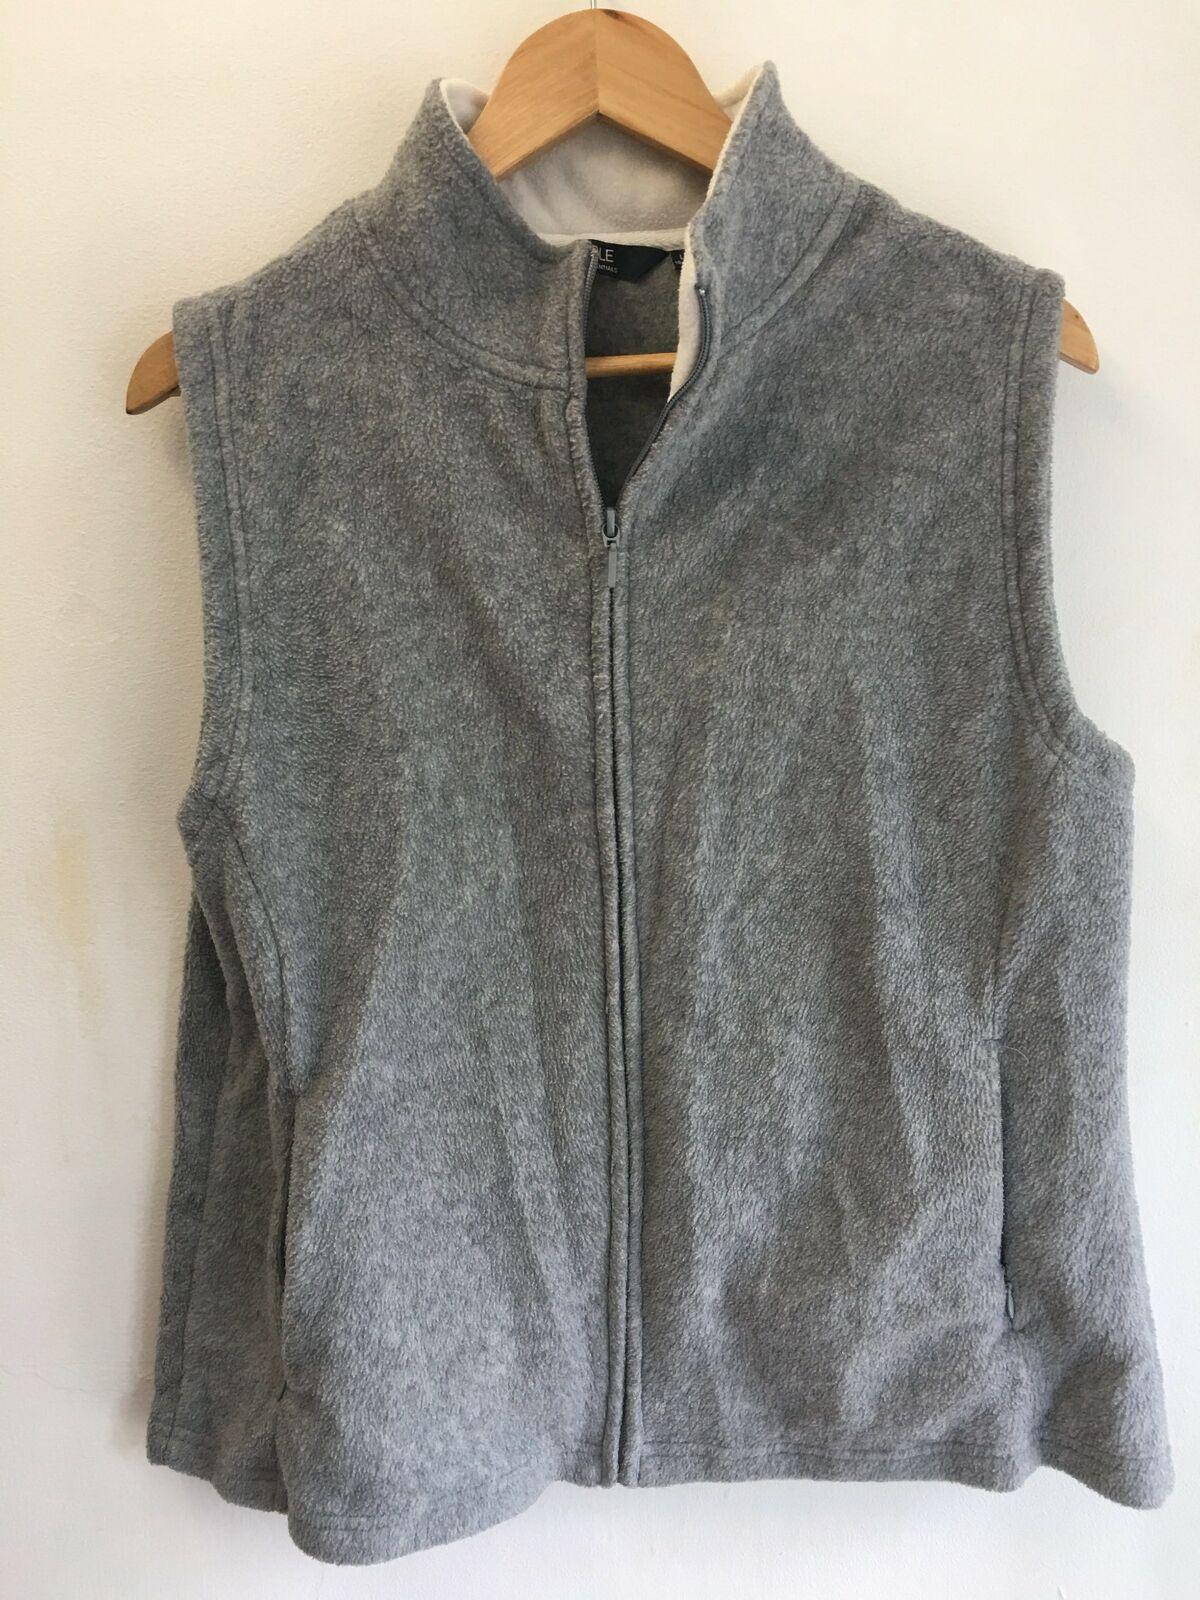 Womens Sleeveless Fleece Gillet by ISLE ESSENTIALS - Size 20